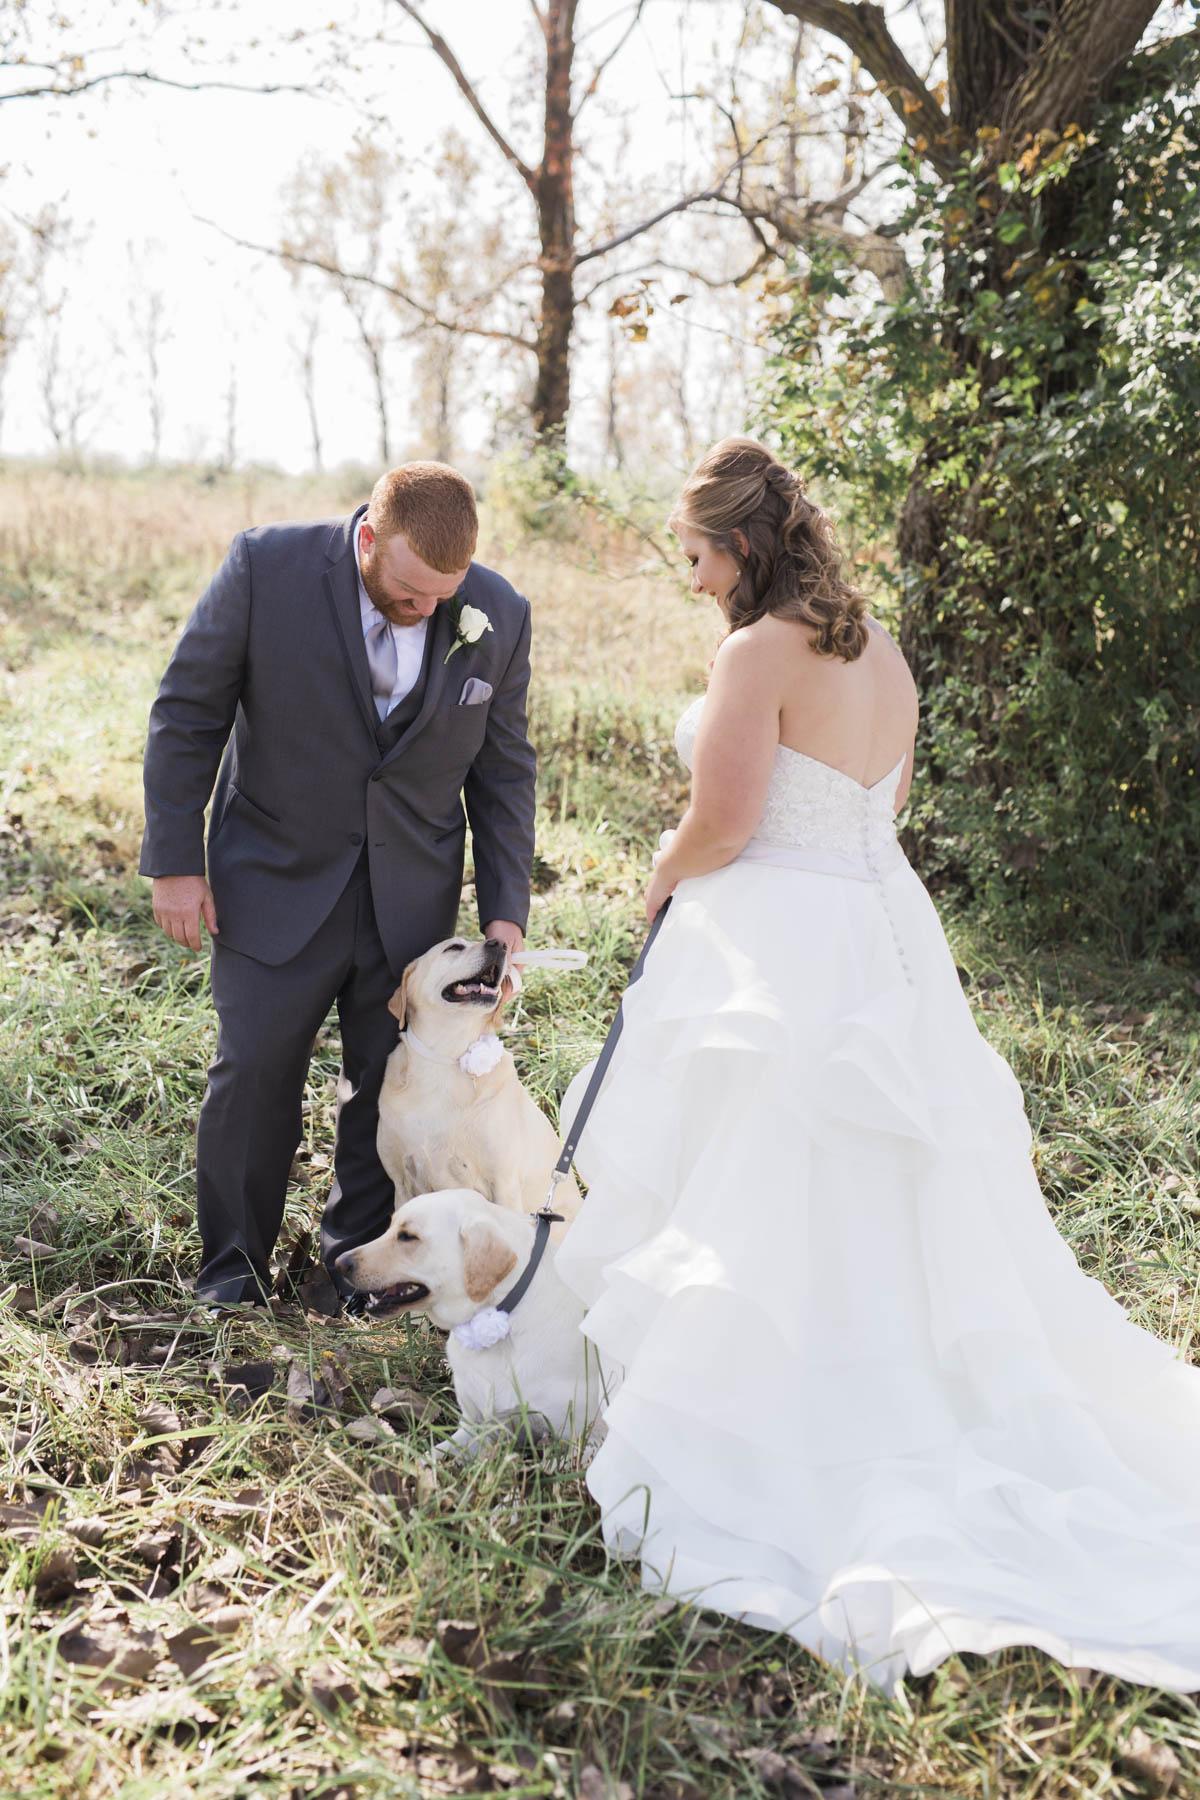 shotbychelsea_blog_wedding-12.jpg